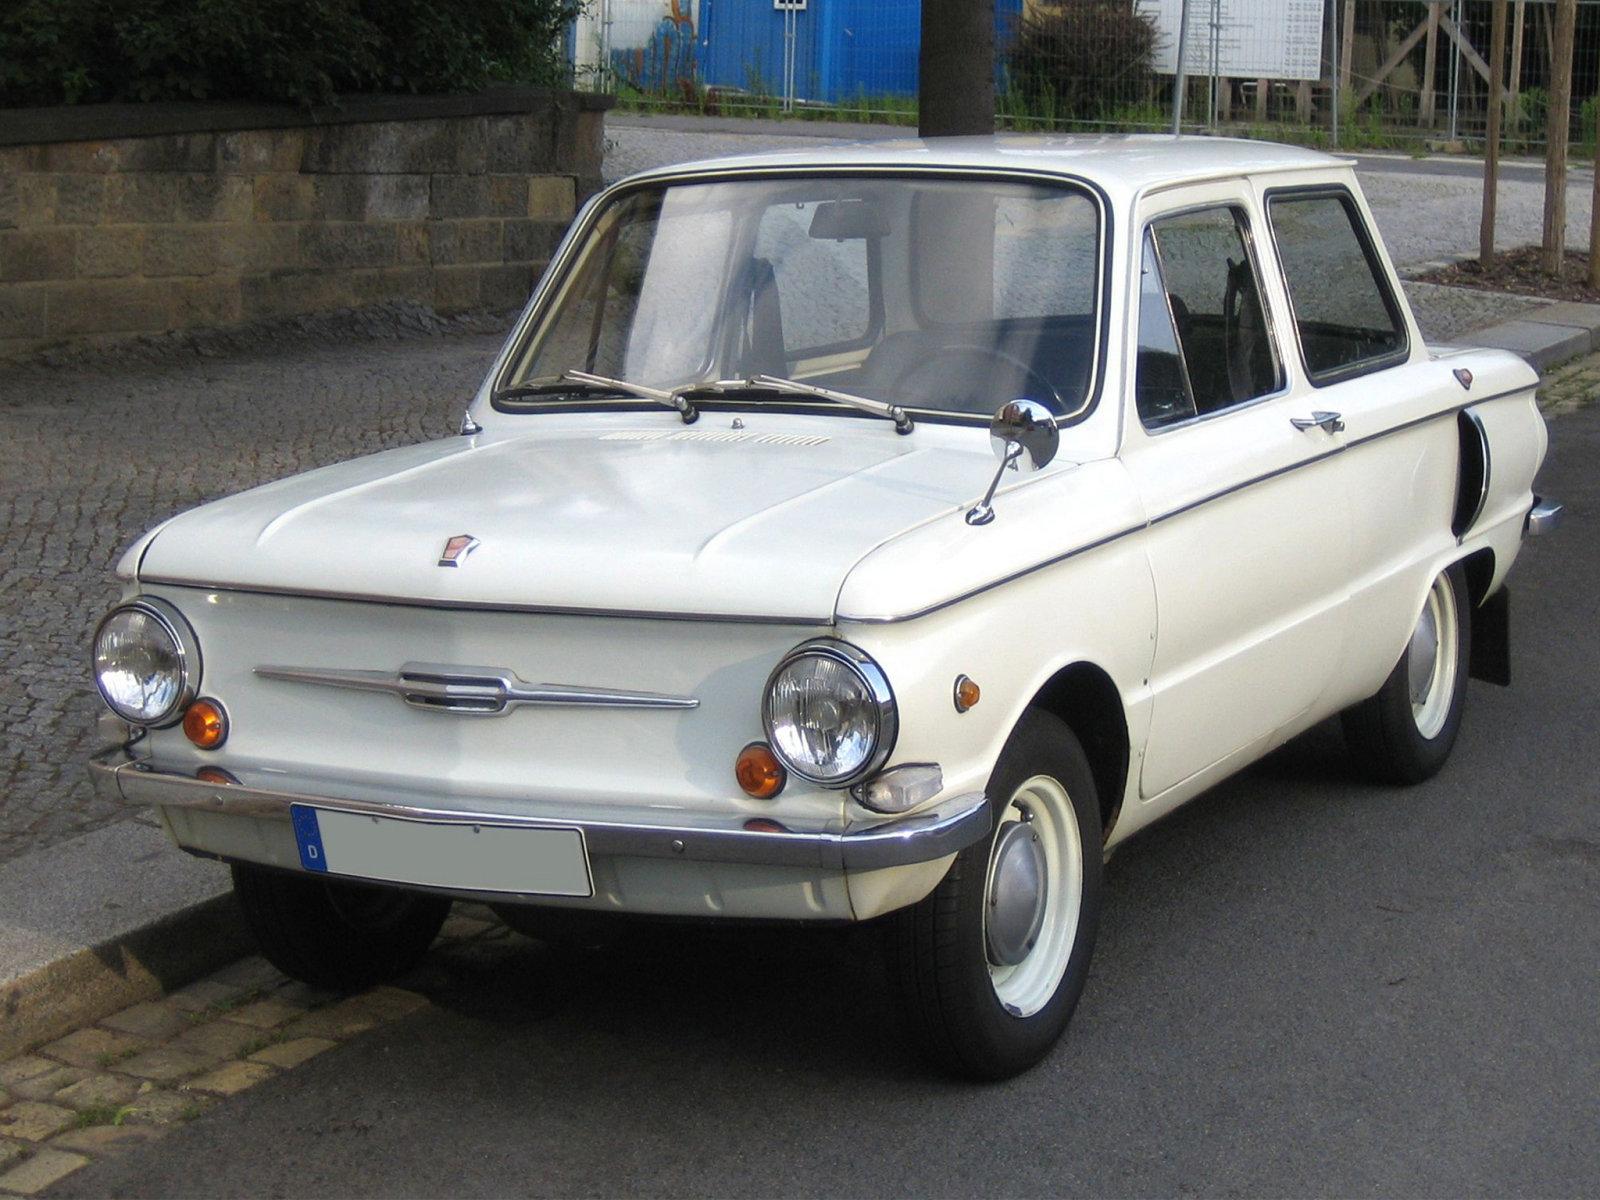 ZAZ_9681_Coupe_1974